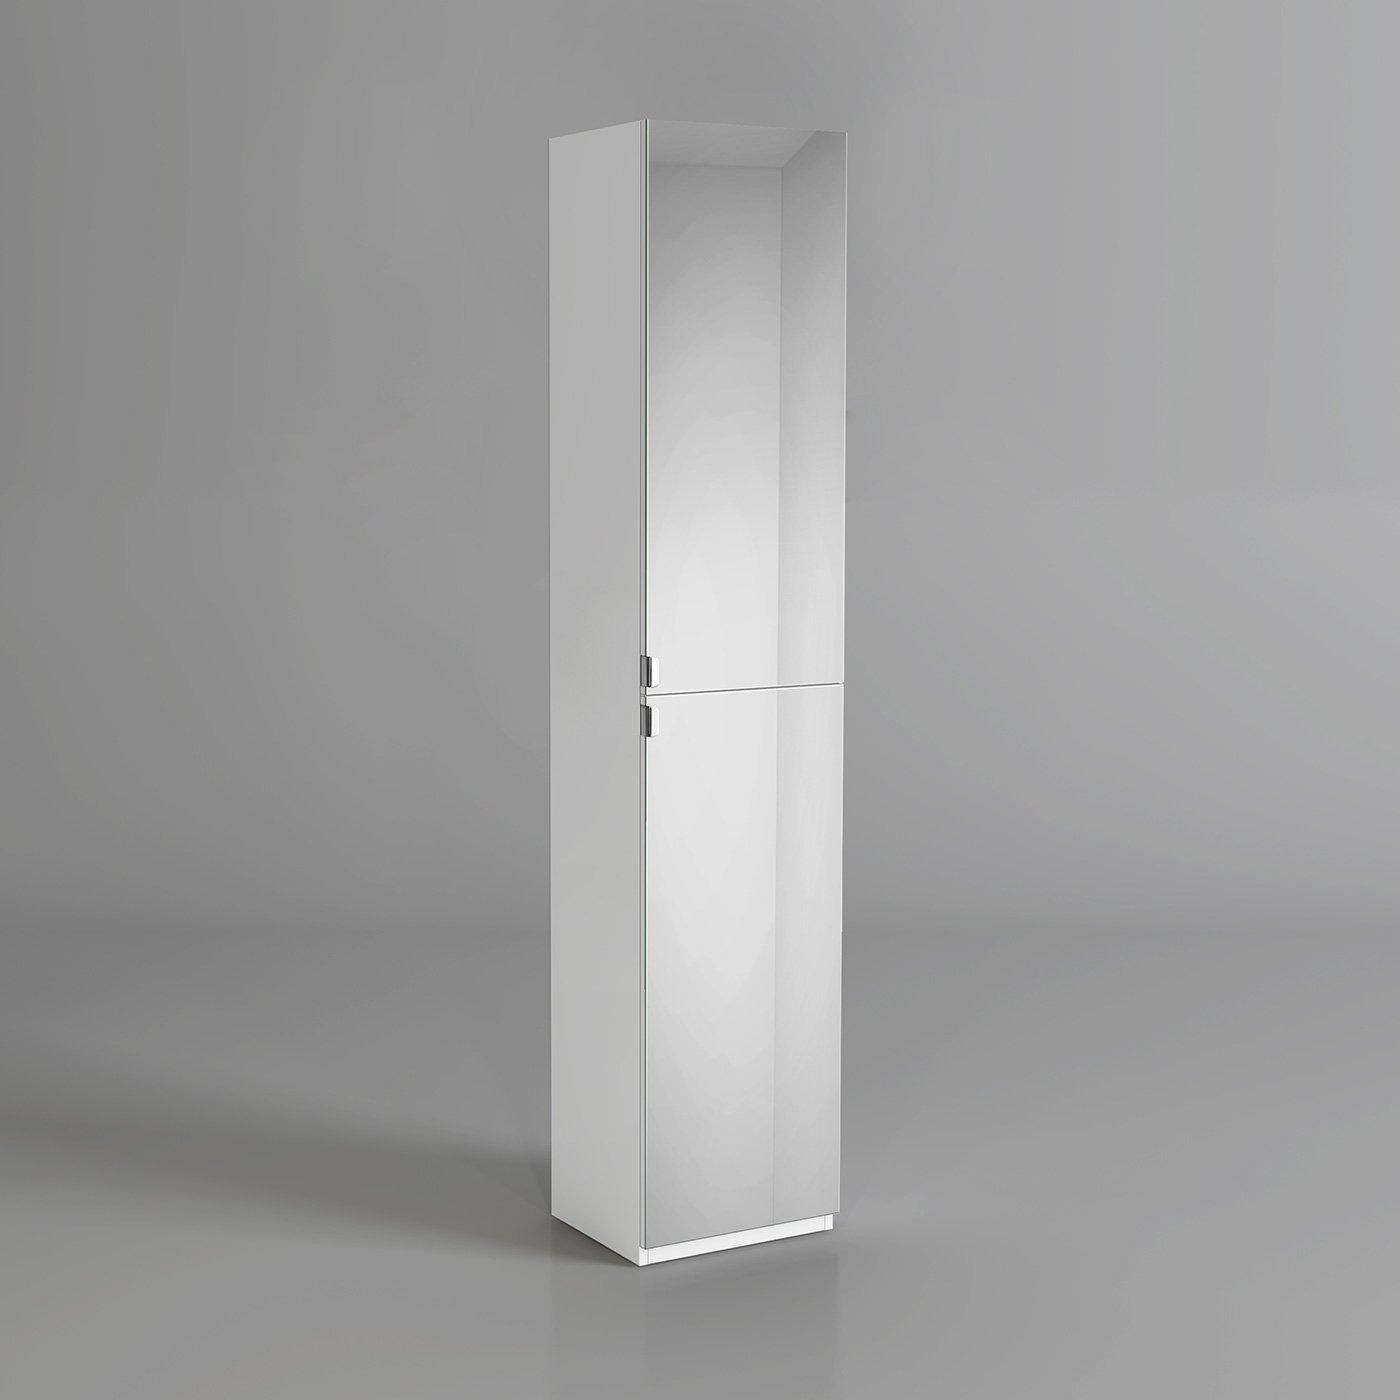 1700mm tall bathroom mirror cabinet reversible cupboard floor storage furniture ibathuk amazon co uk kitchen home